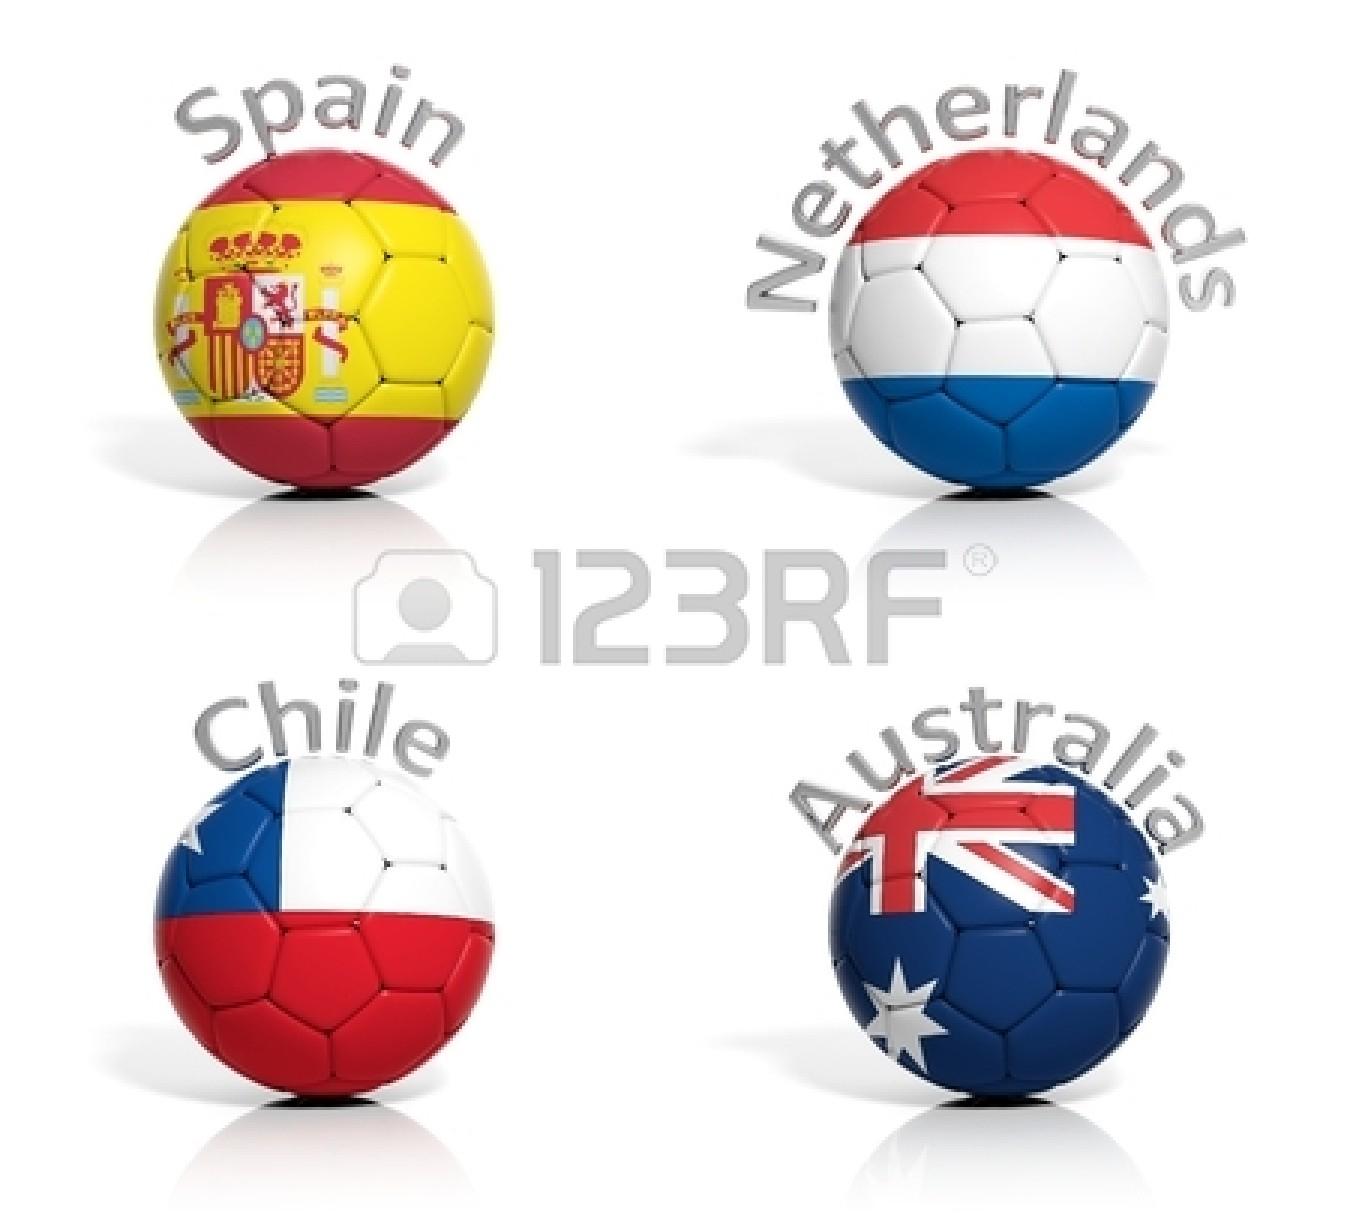 Diretta-oggi-Cile-Australia-Cricfree-e-LiveTv-streaming-gratis-partita-live-su-Sky-Go